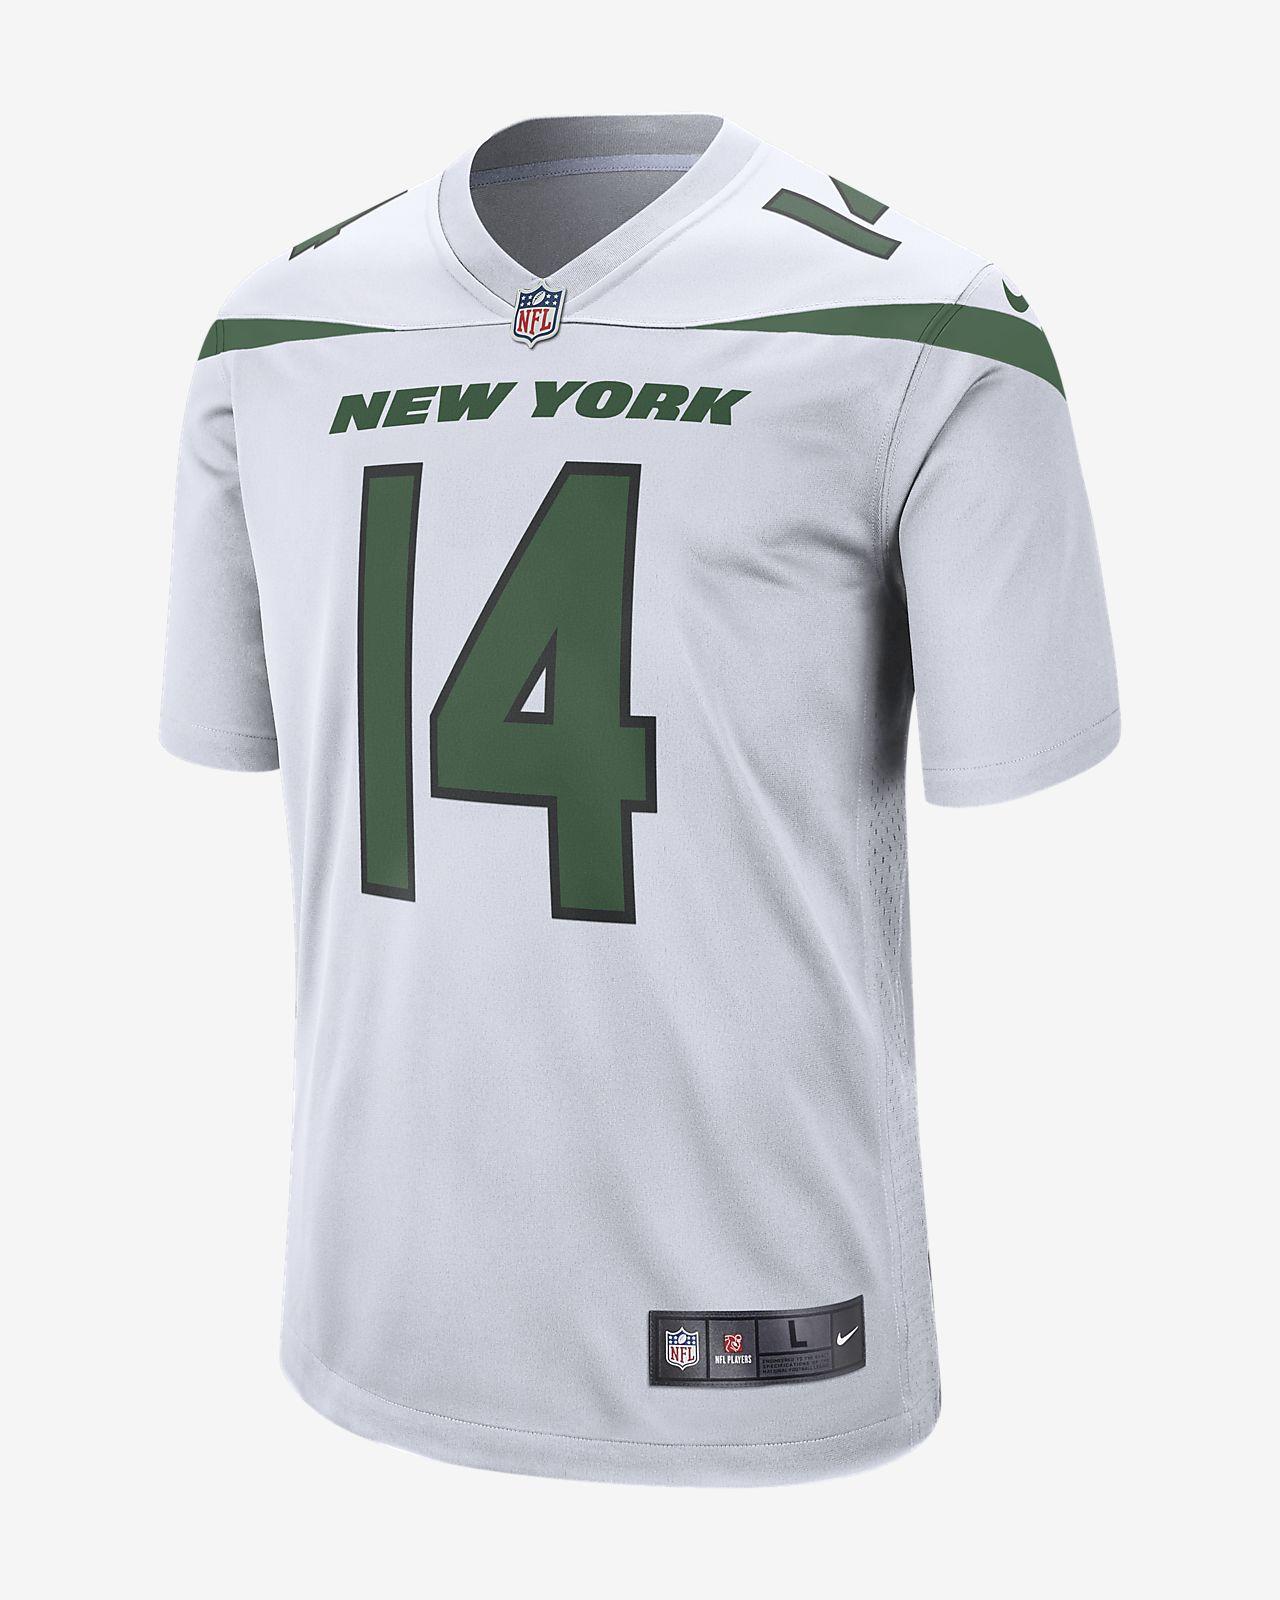 b8816f00f46 NFL New York Jets (Sam Darnold) Men's Game Football Jersey. Nike.com